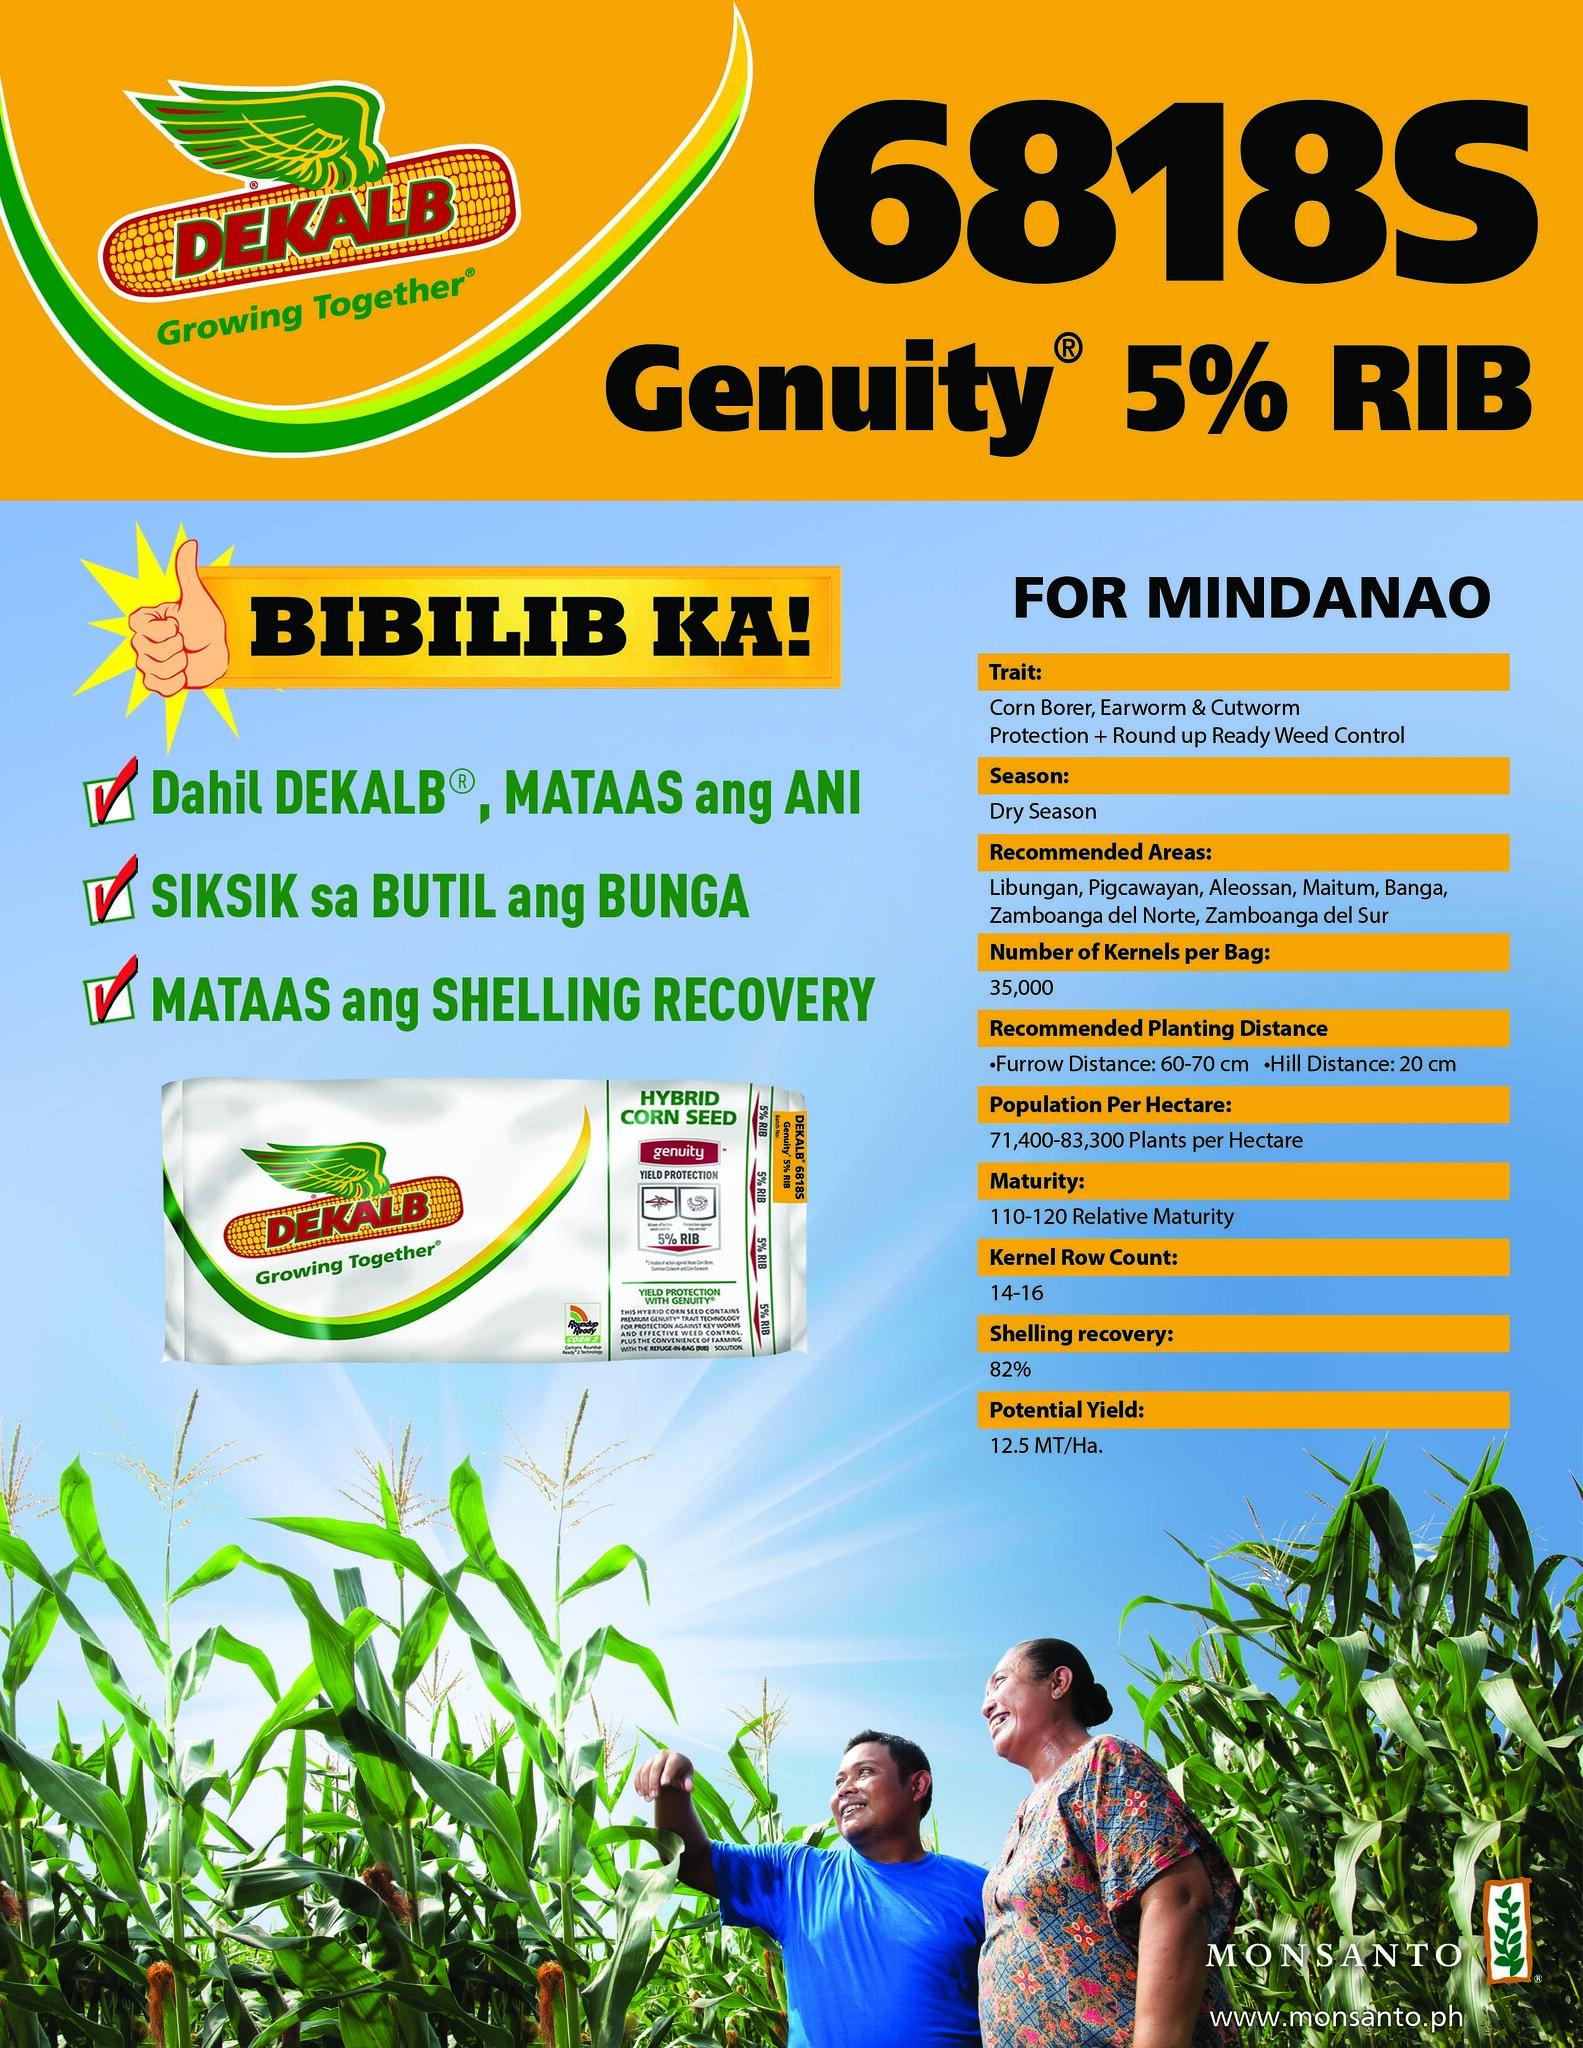 DEKALB 6818S for Mindanao